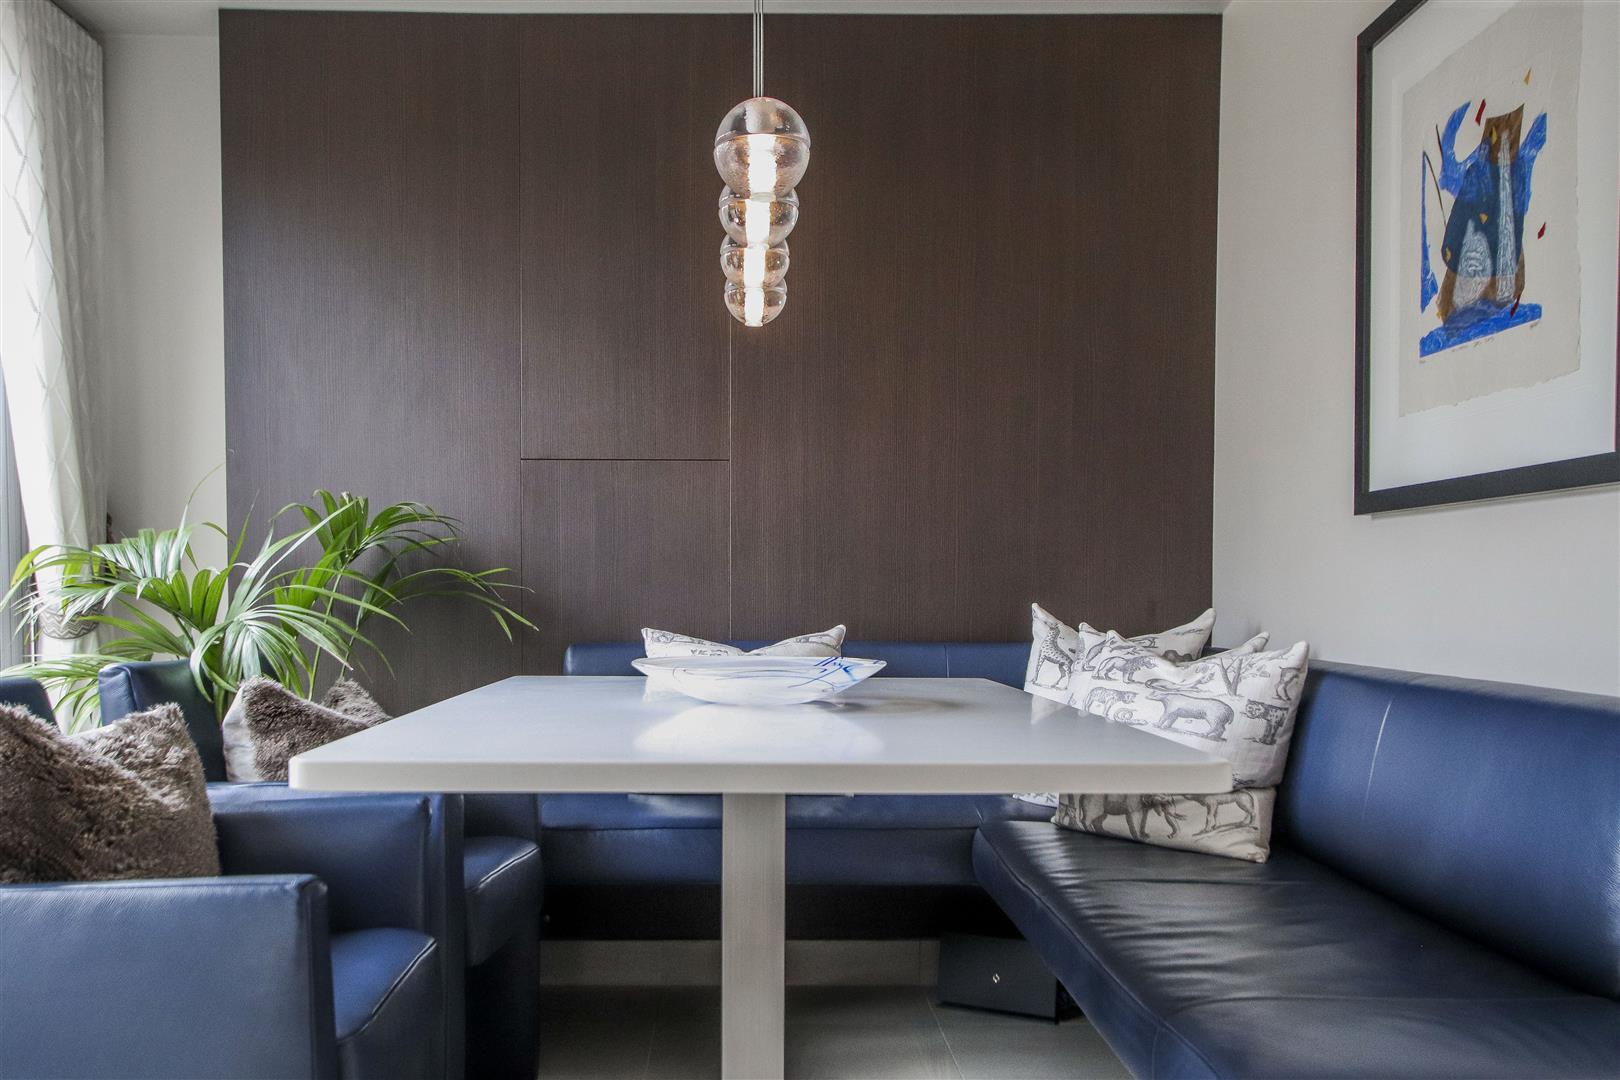 5 Bedroom Semi-detached House For Sale - 47.JPG